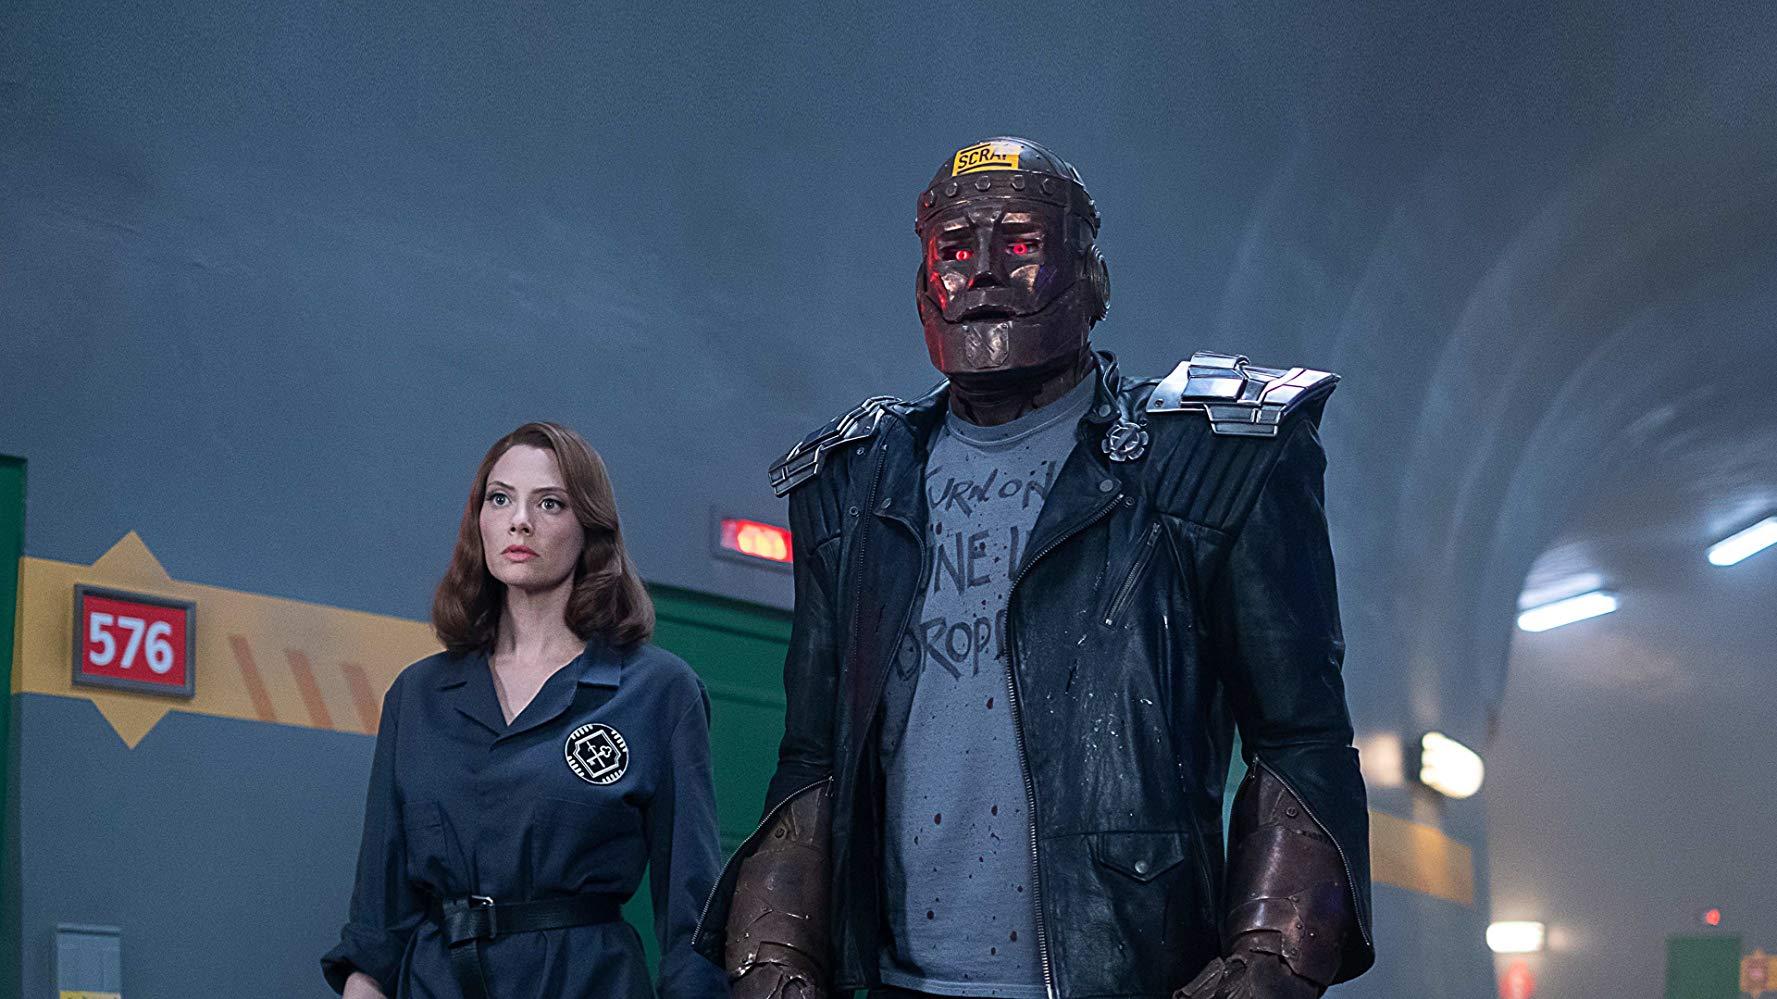 [News] Doom Patrol: The Complete First Season Coming to Blu-ray & DVD